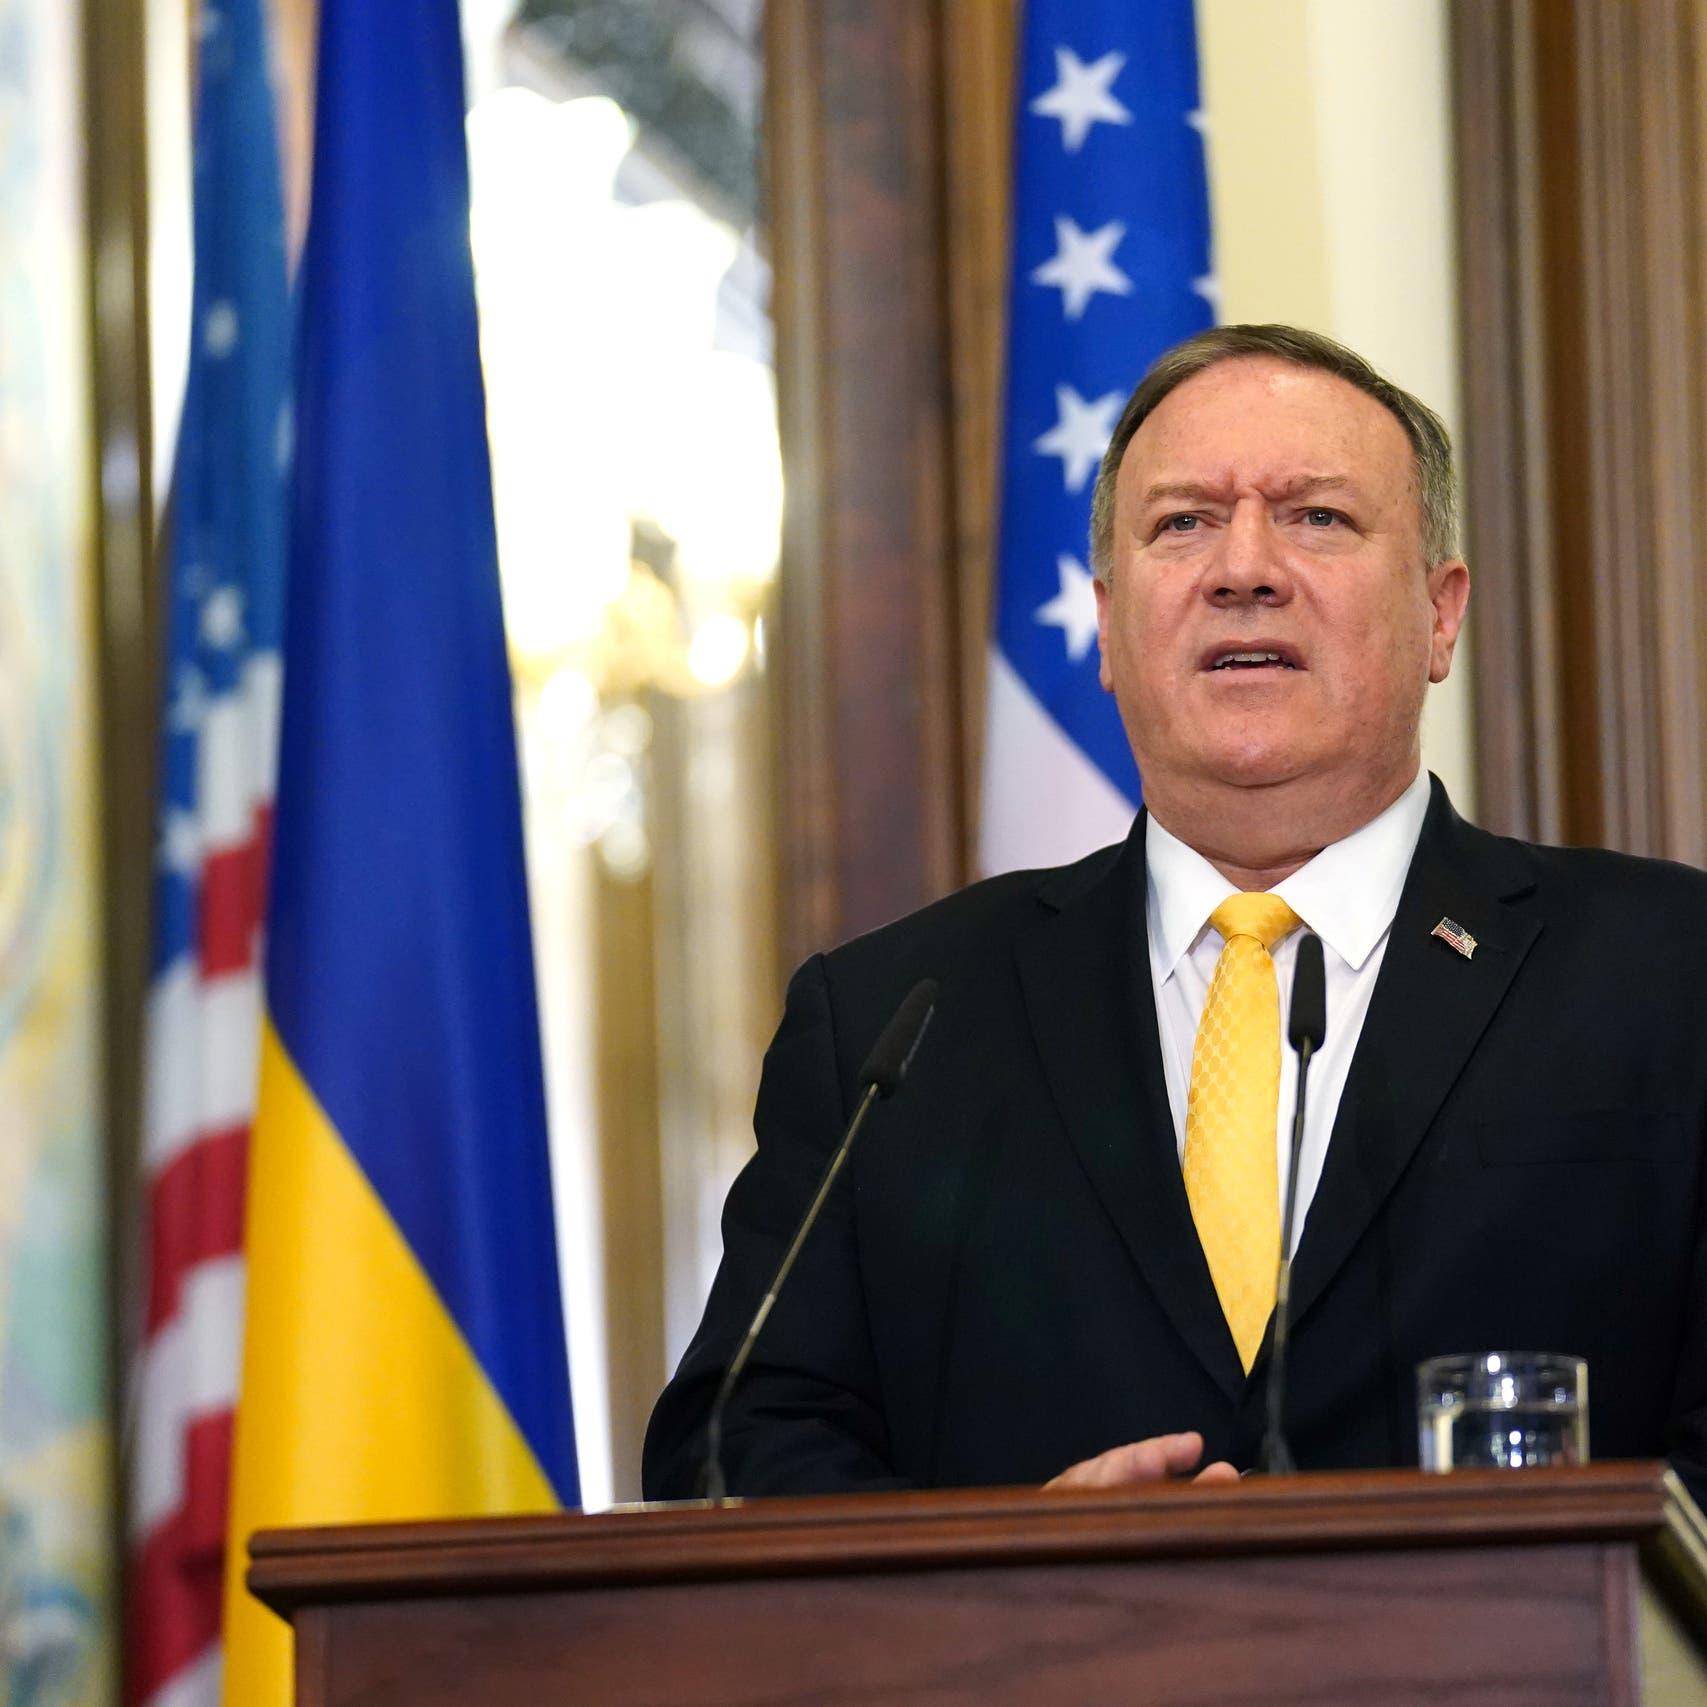 بومبيو يحذر: سلوك إيران خطير.. تخيلوا لو حصلت على سلاح نووي